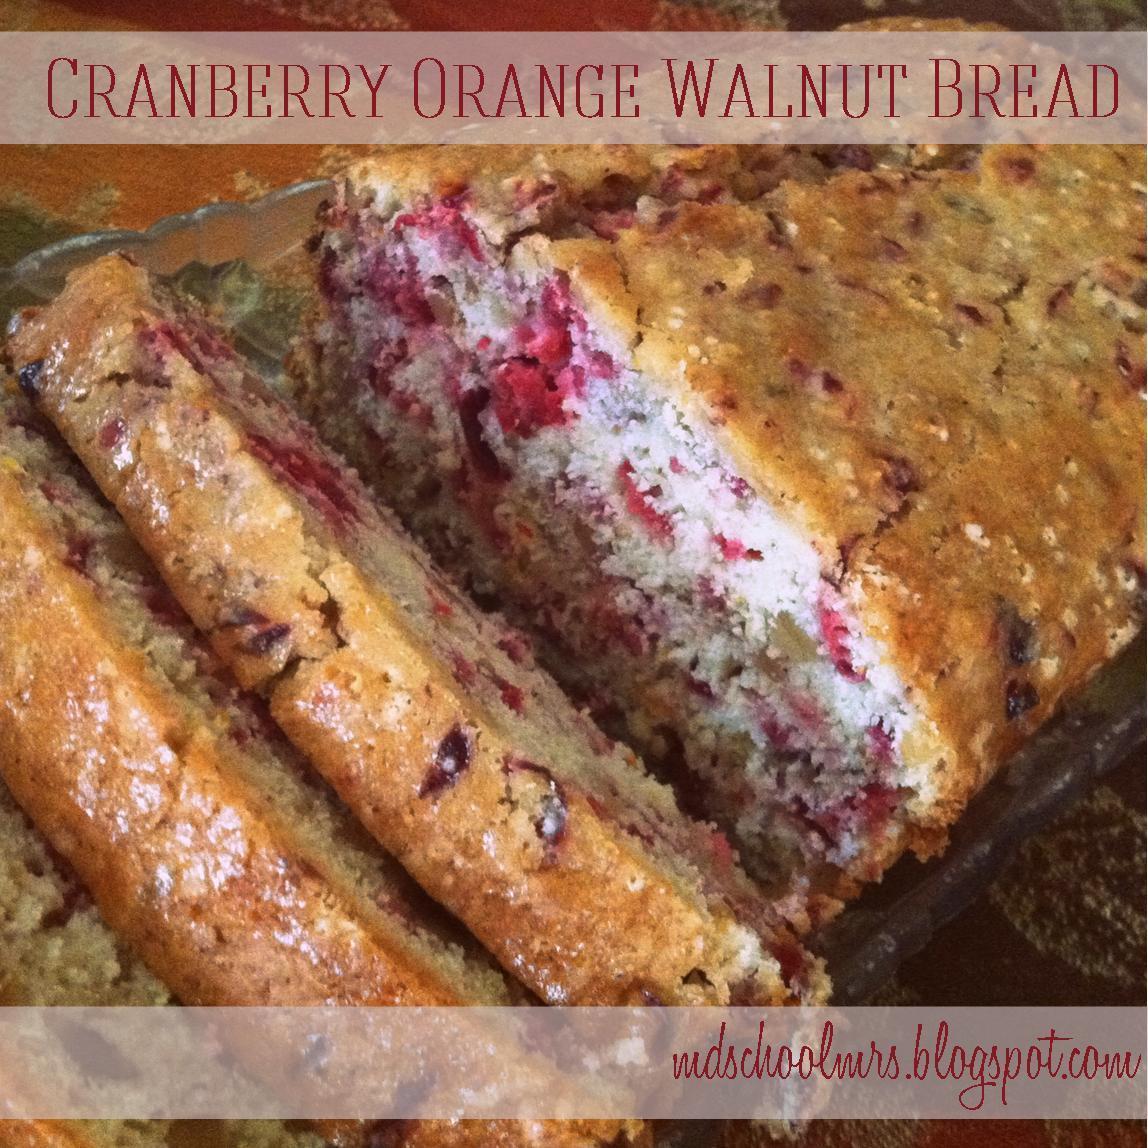 MD School Mrs.: Cranberry Orange Walnut Bread